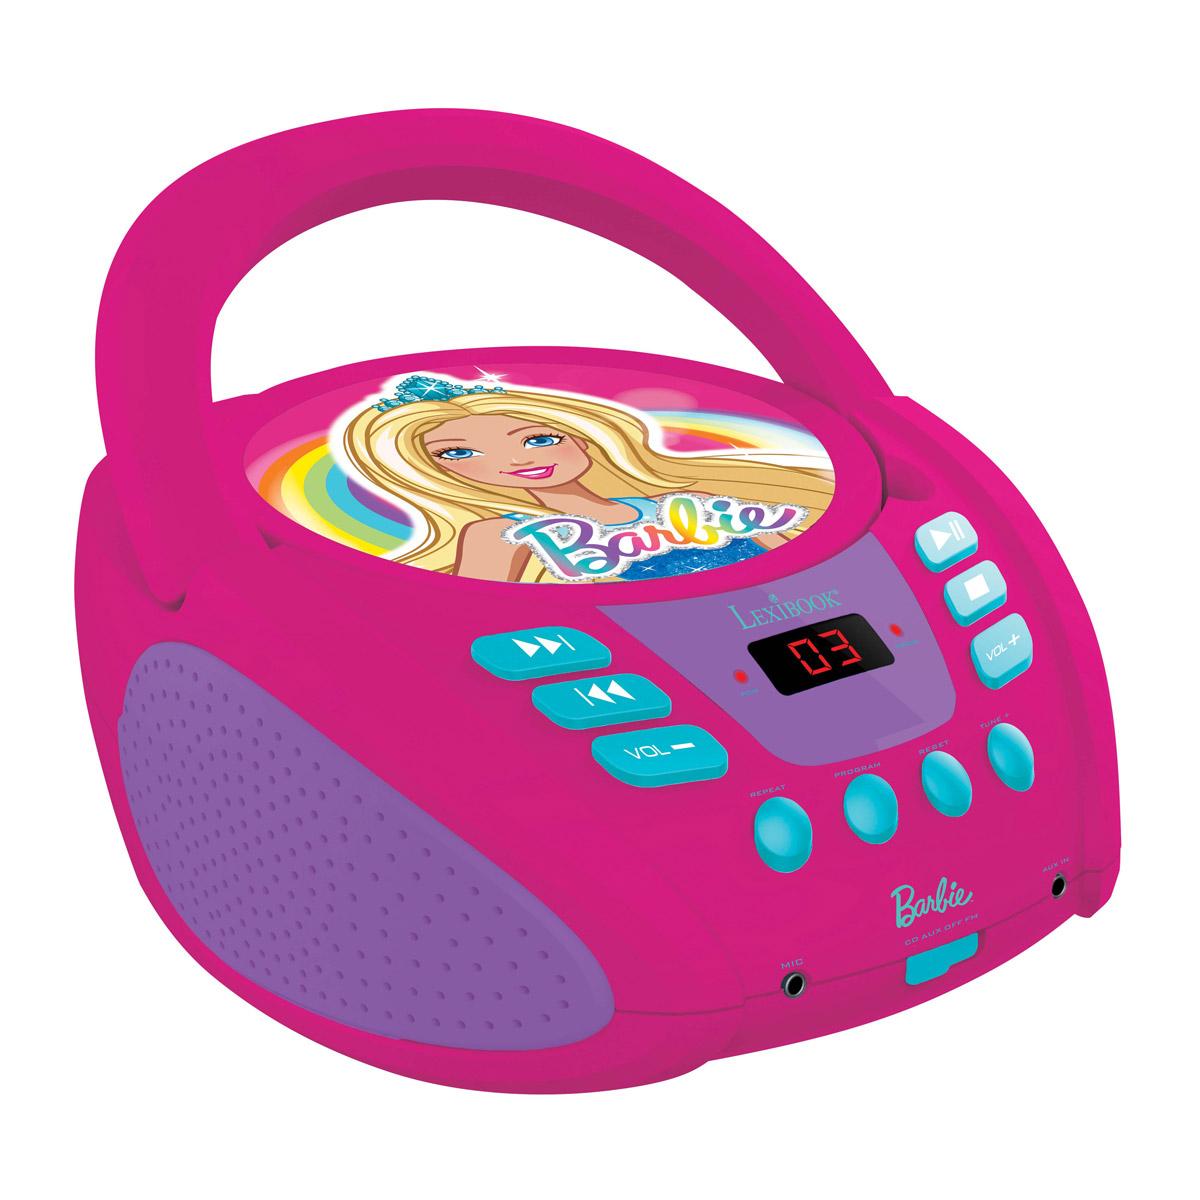 Lexibook - Barbie Portable CD player with Mic Jack (RCD108BB)